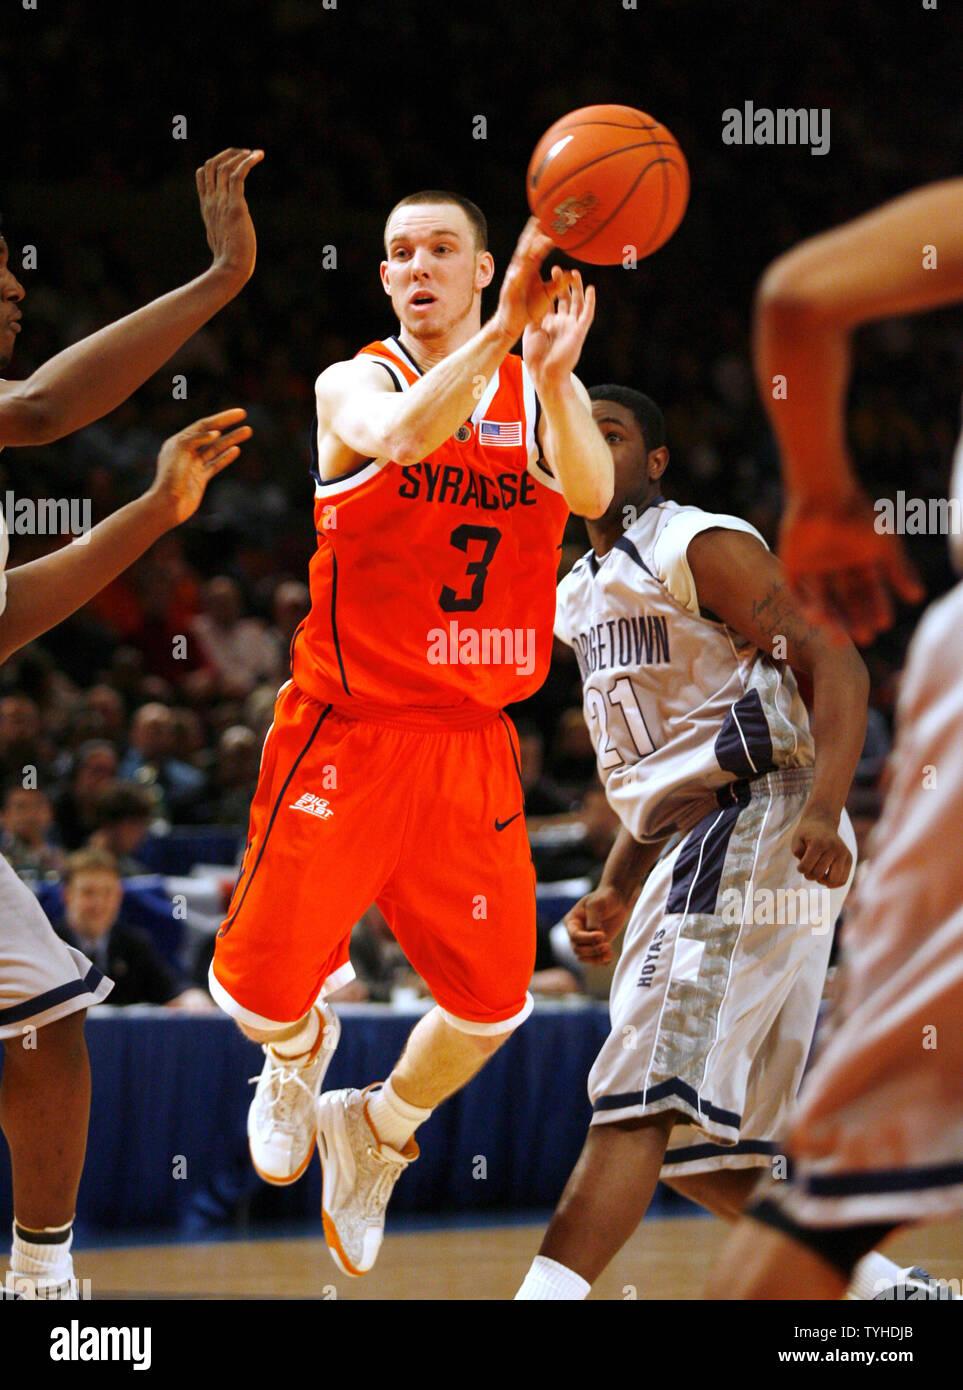 Syracuse Guard 3 Gerry Mcnamara Passes The Basketball